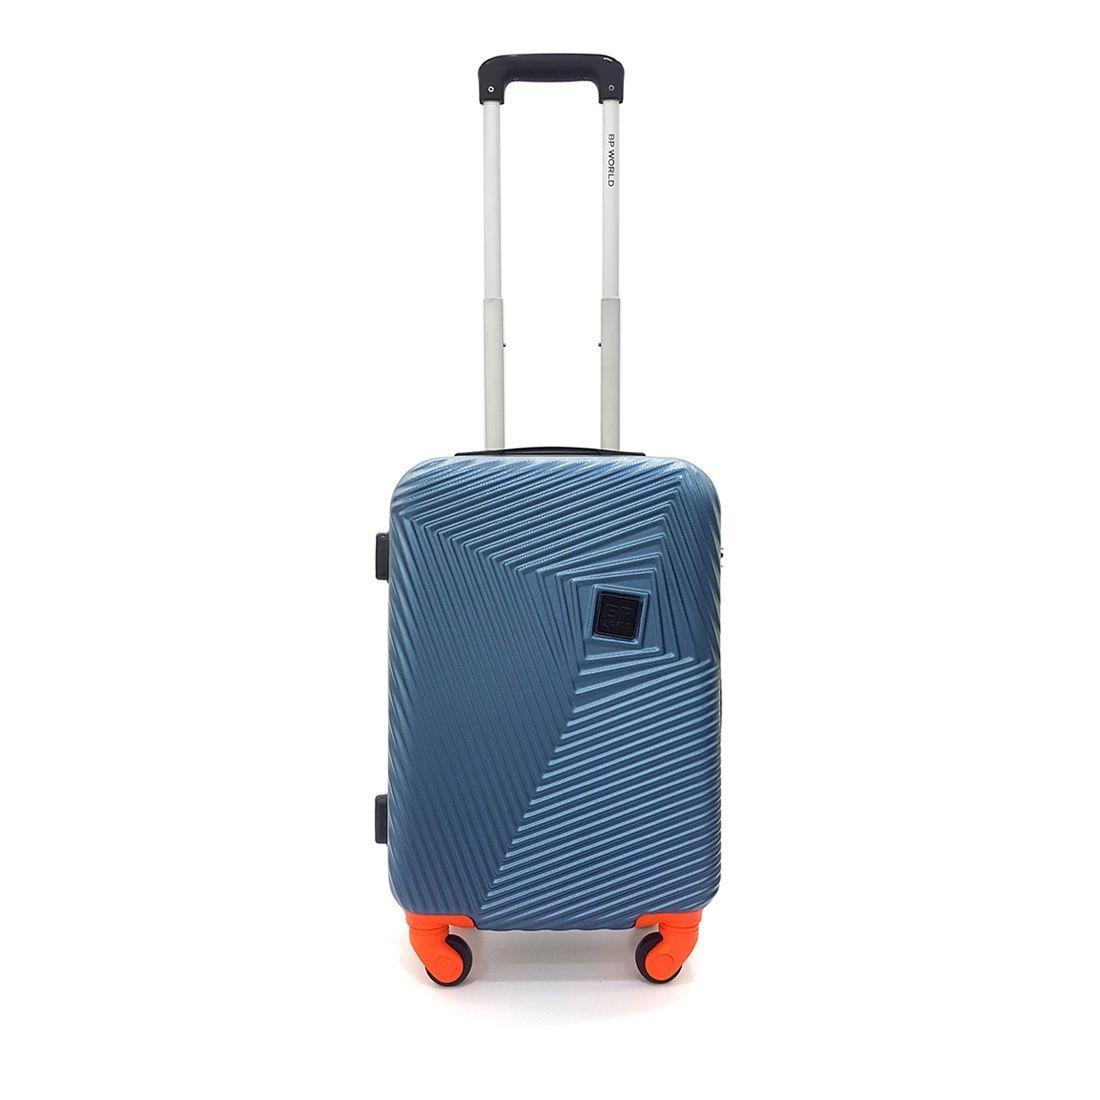 BP WORLD กระเป๋าเดินทาง 20 นิ้ว รุ่น 121 (สีฟ้า)